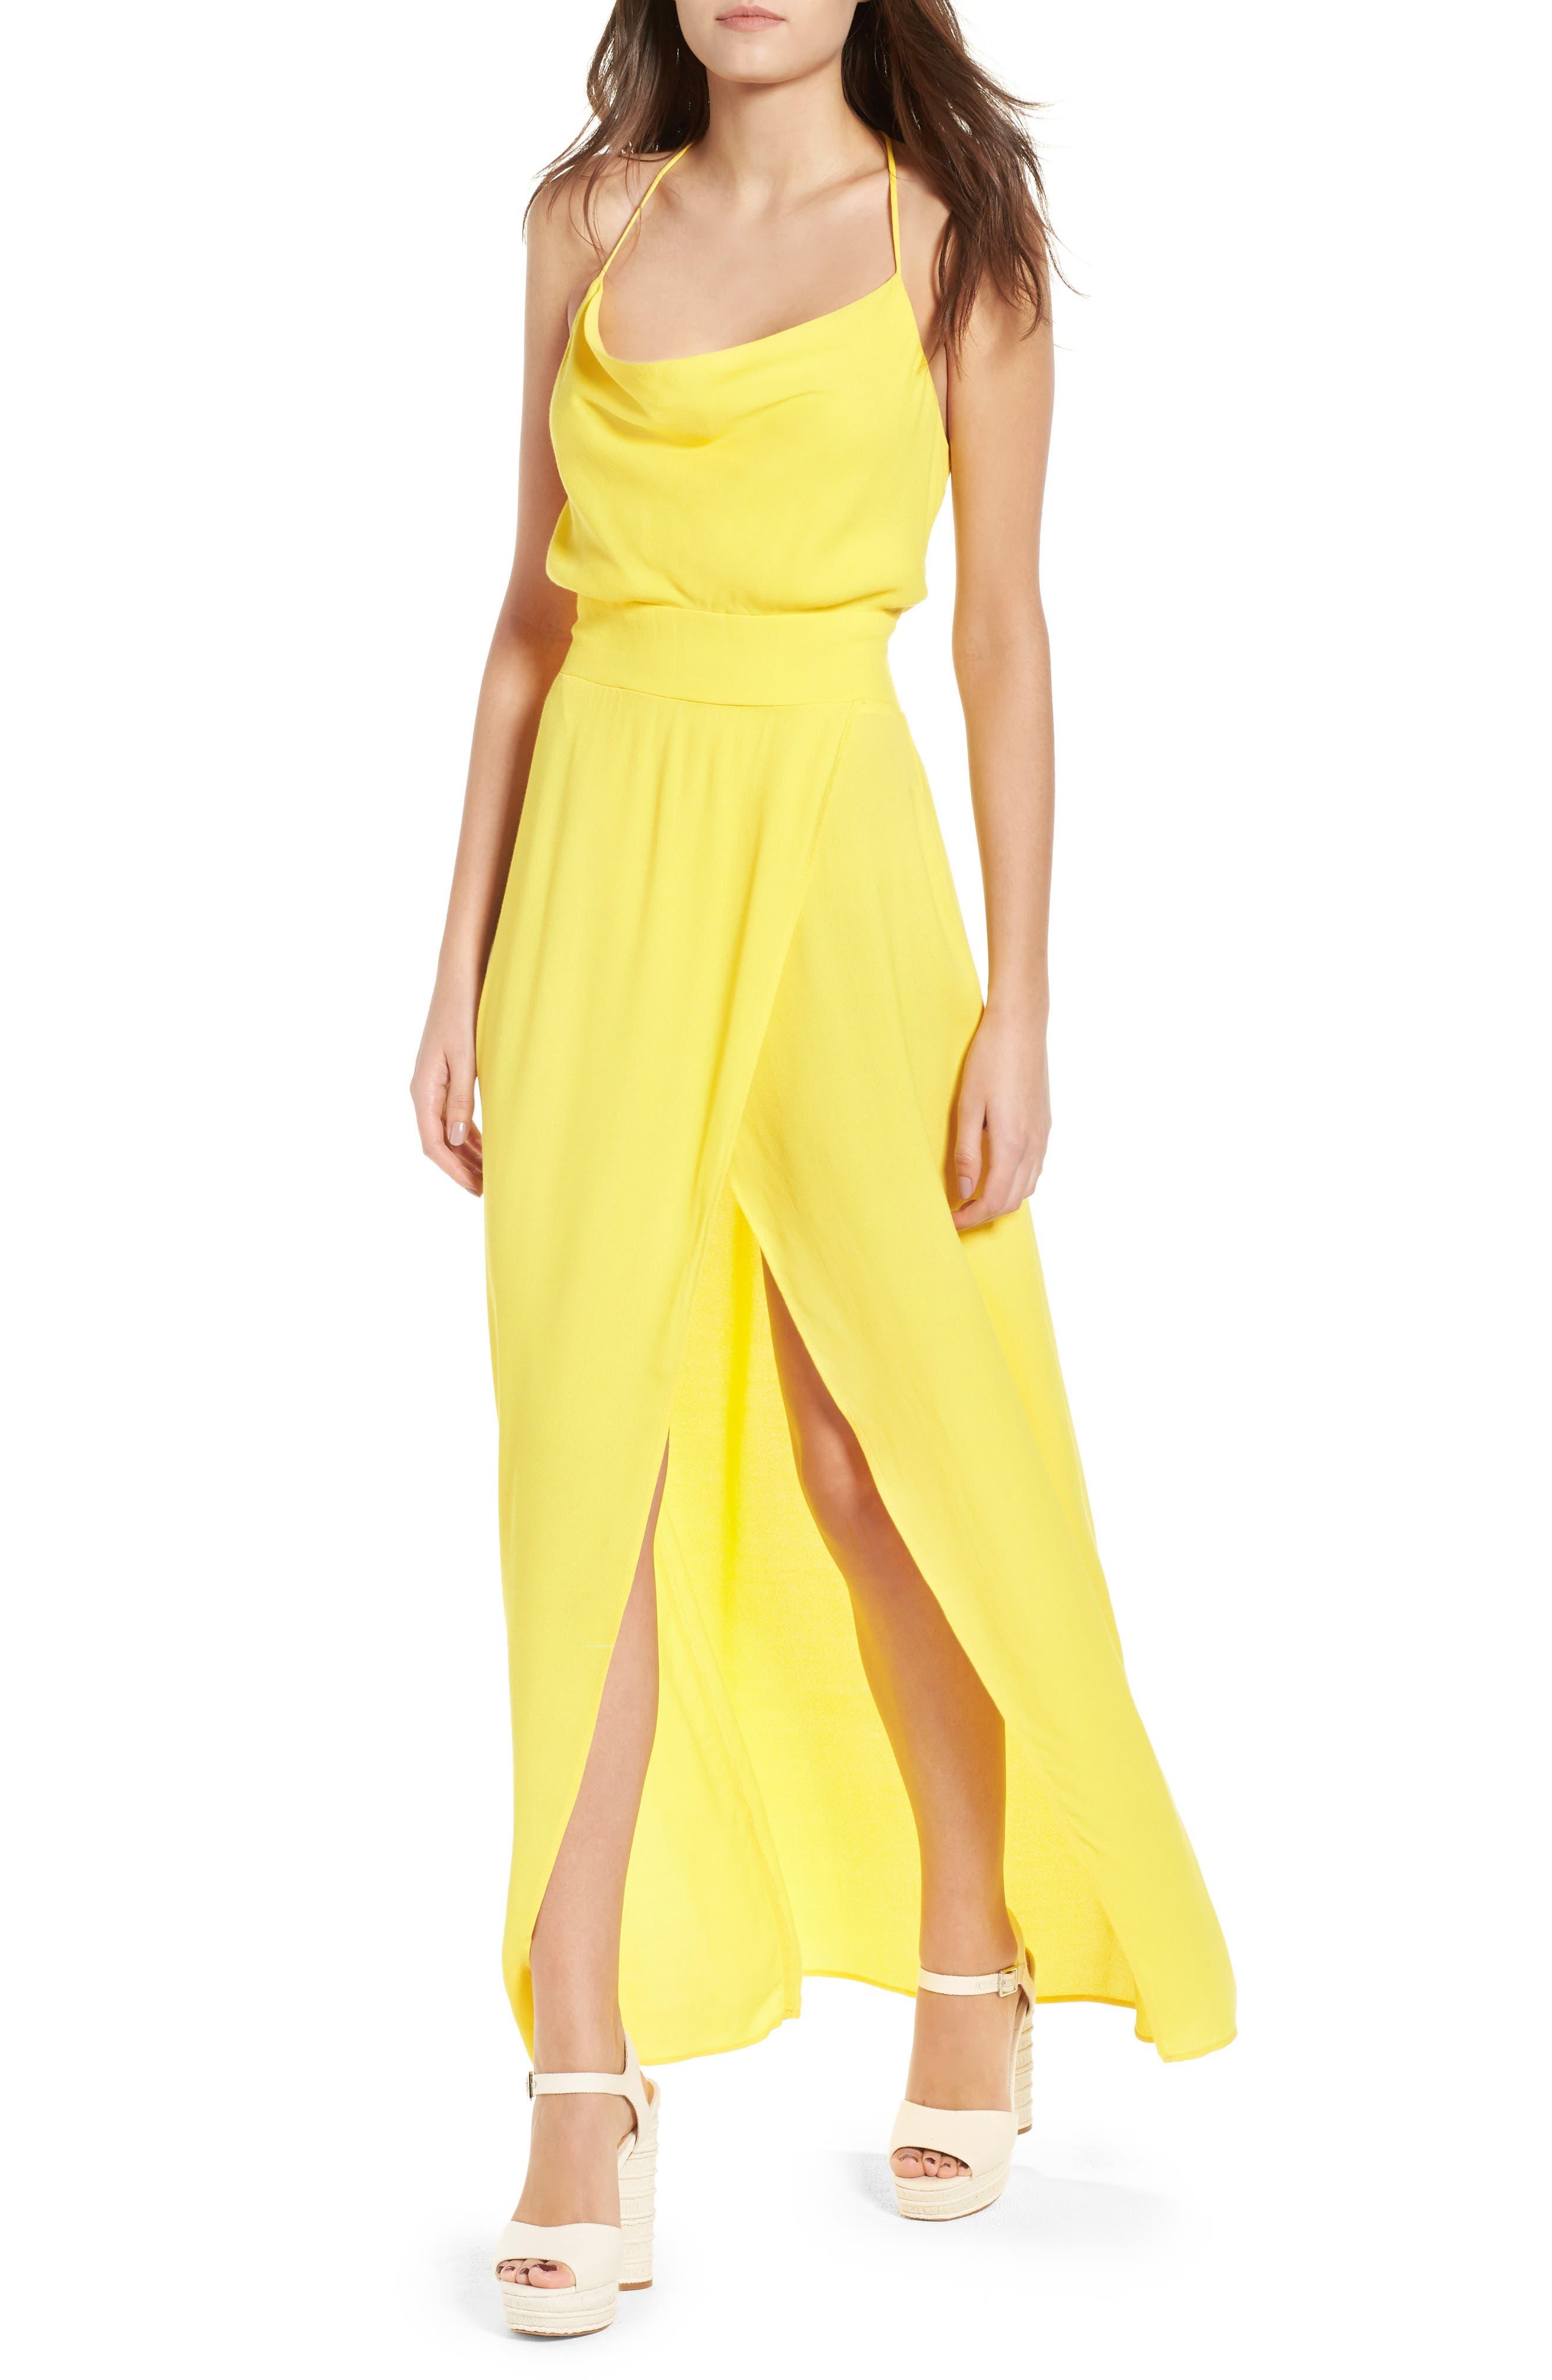 Rain Maxi Dress,                         Main,                         color, Gold